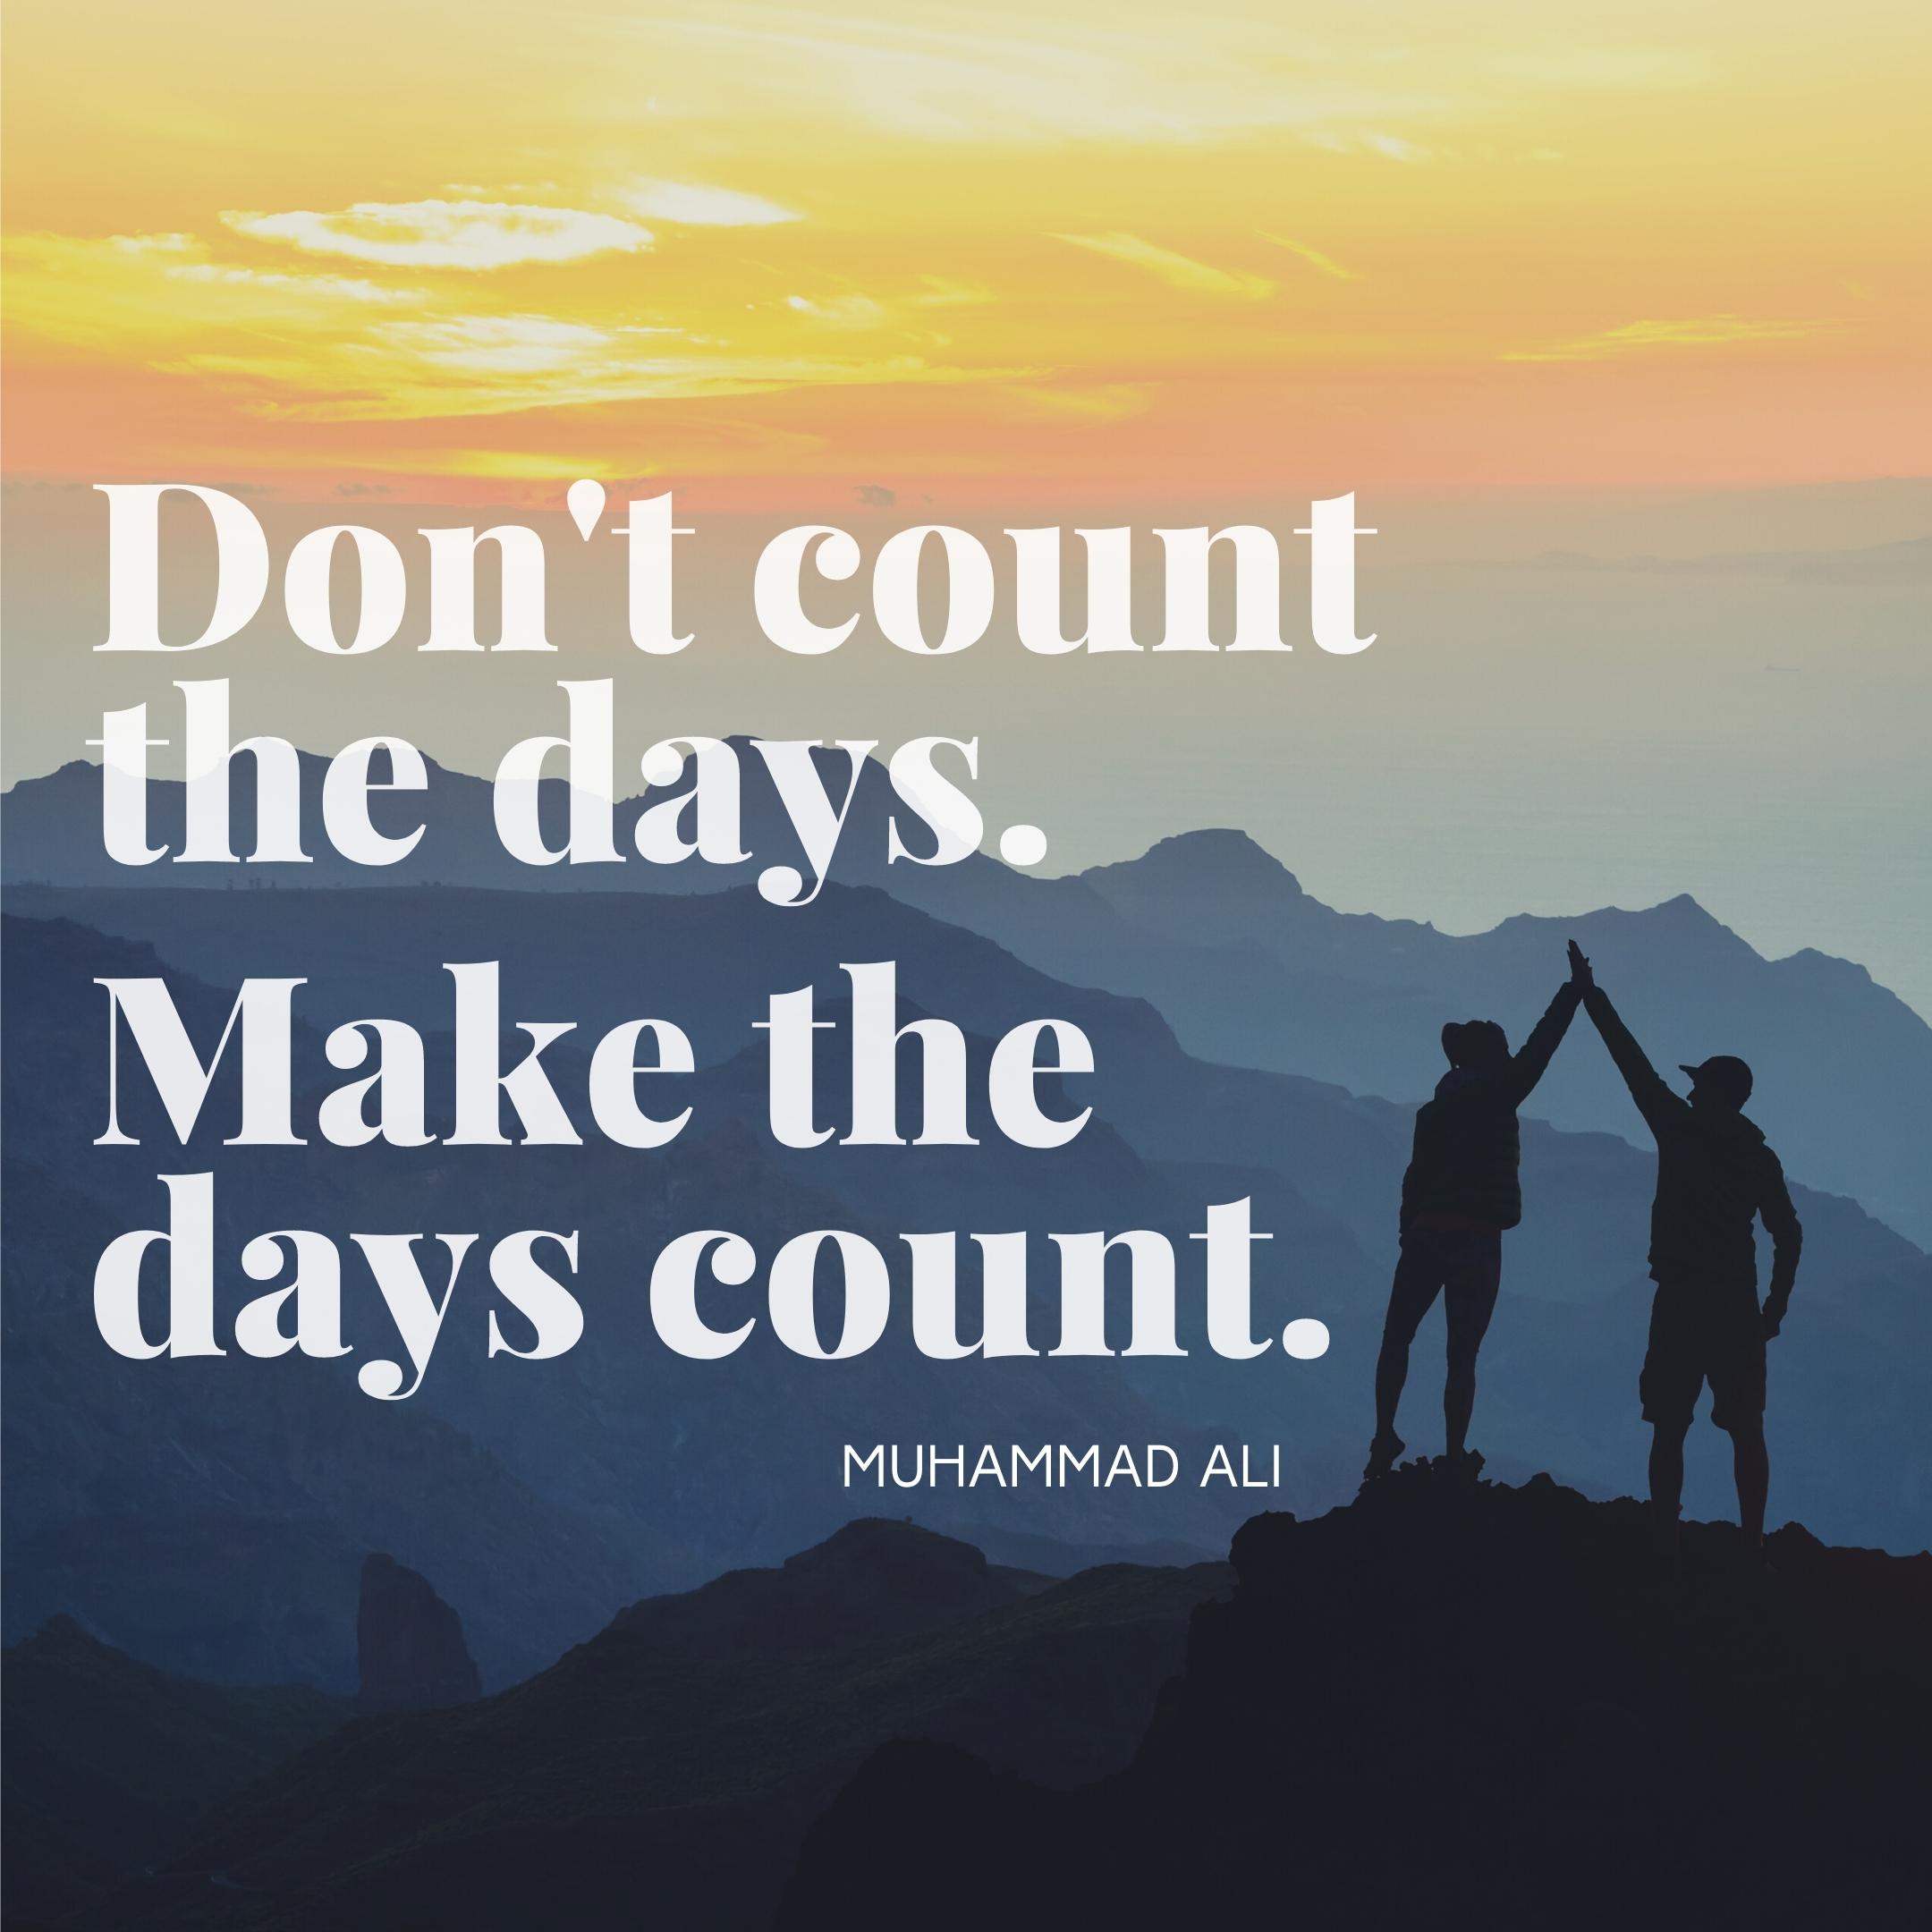 muhammad ali quote   daily motivation